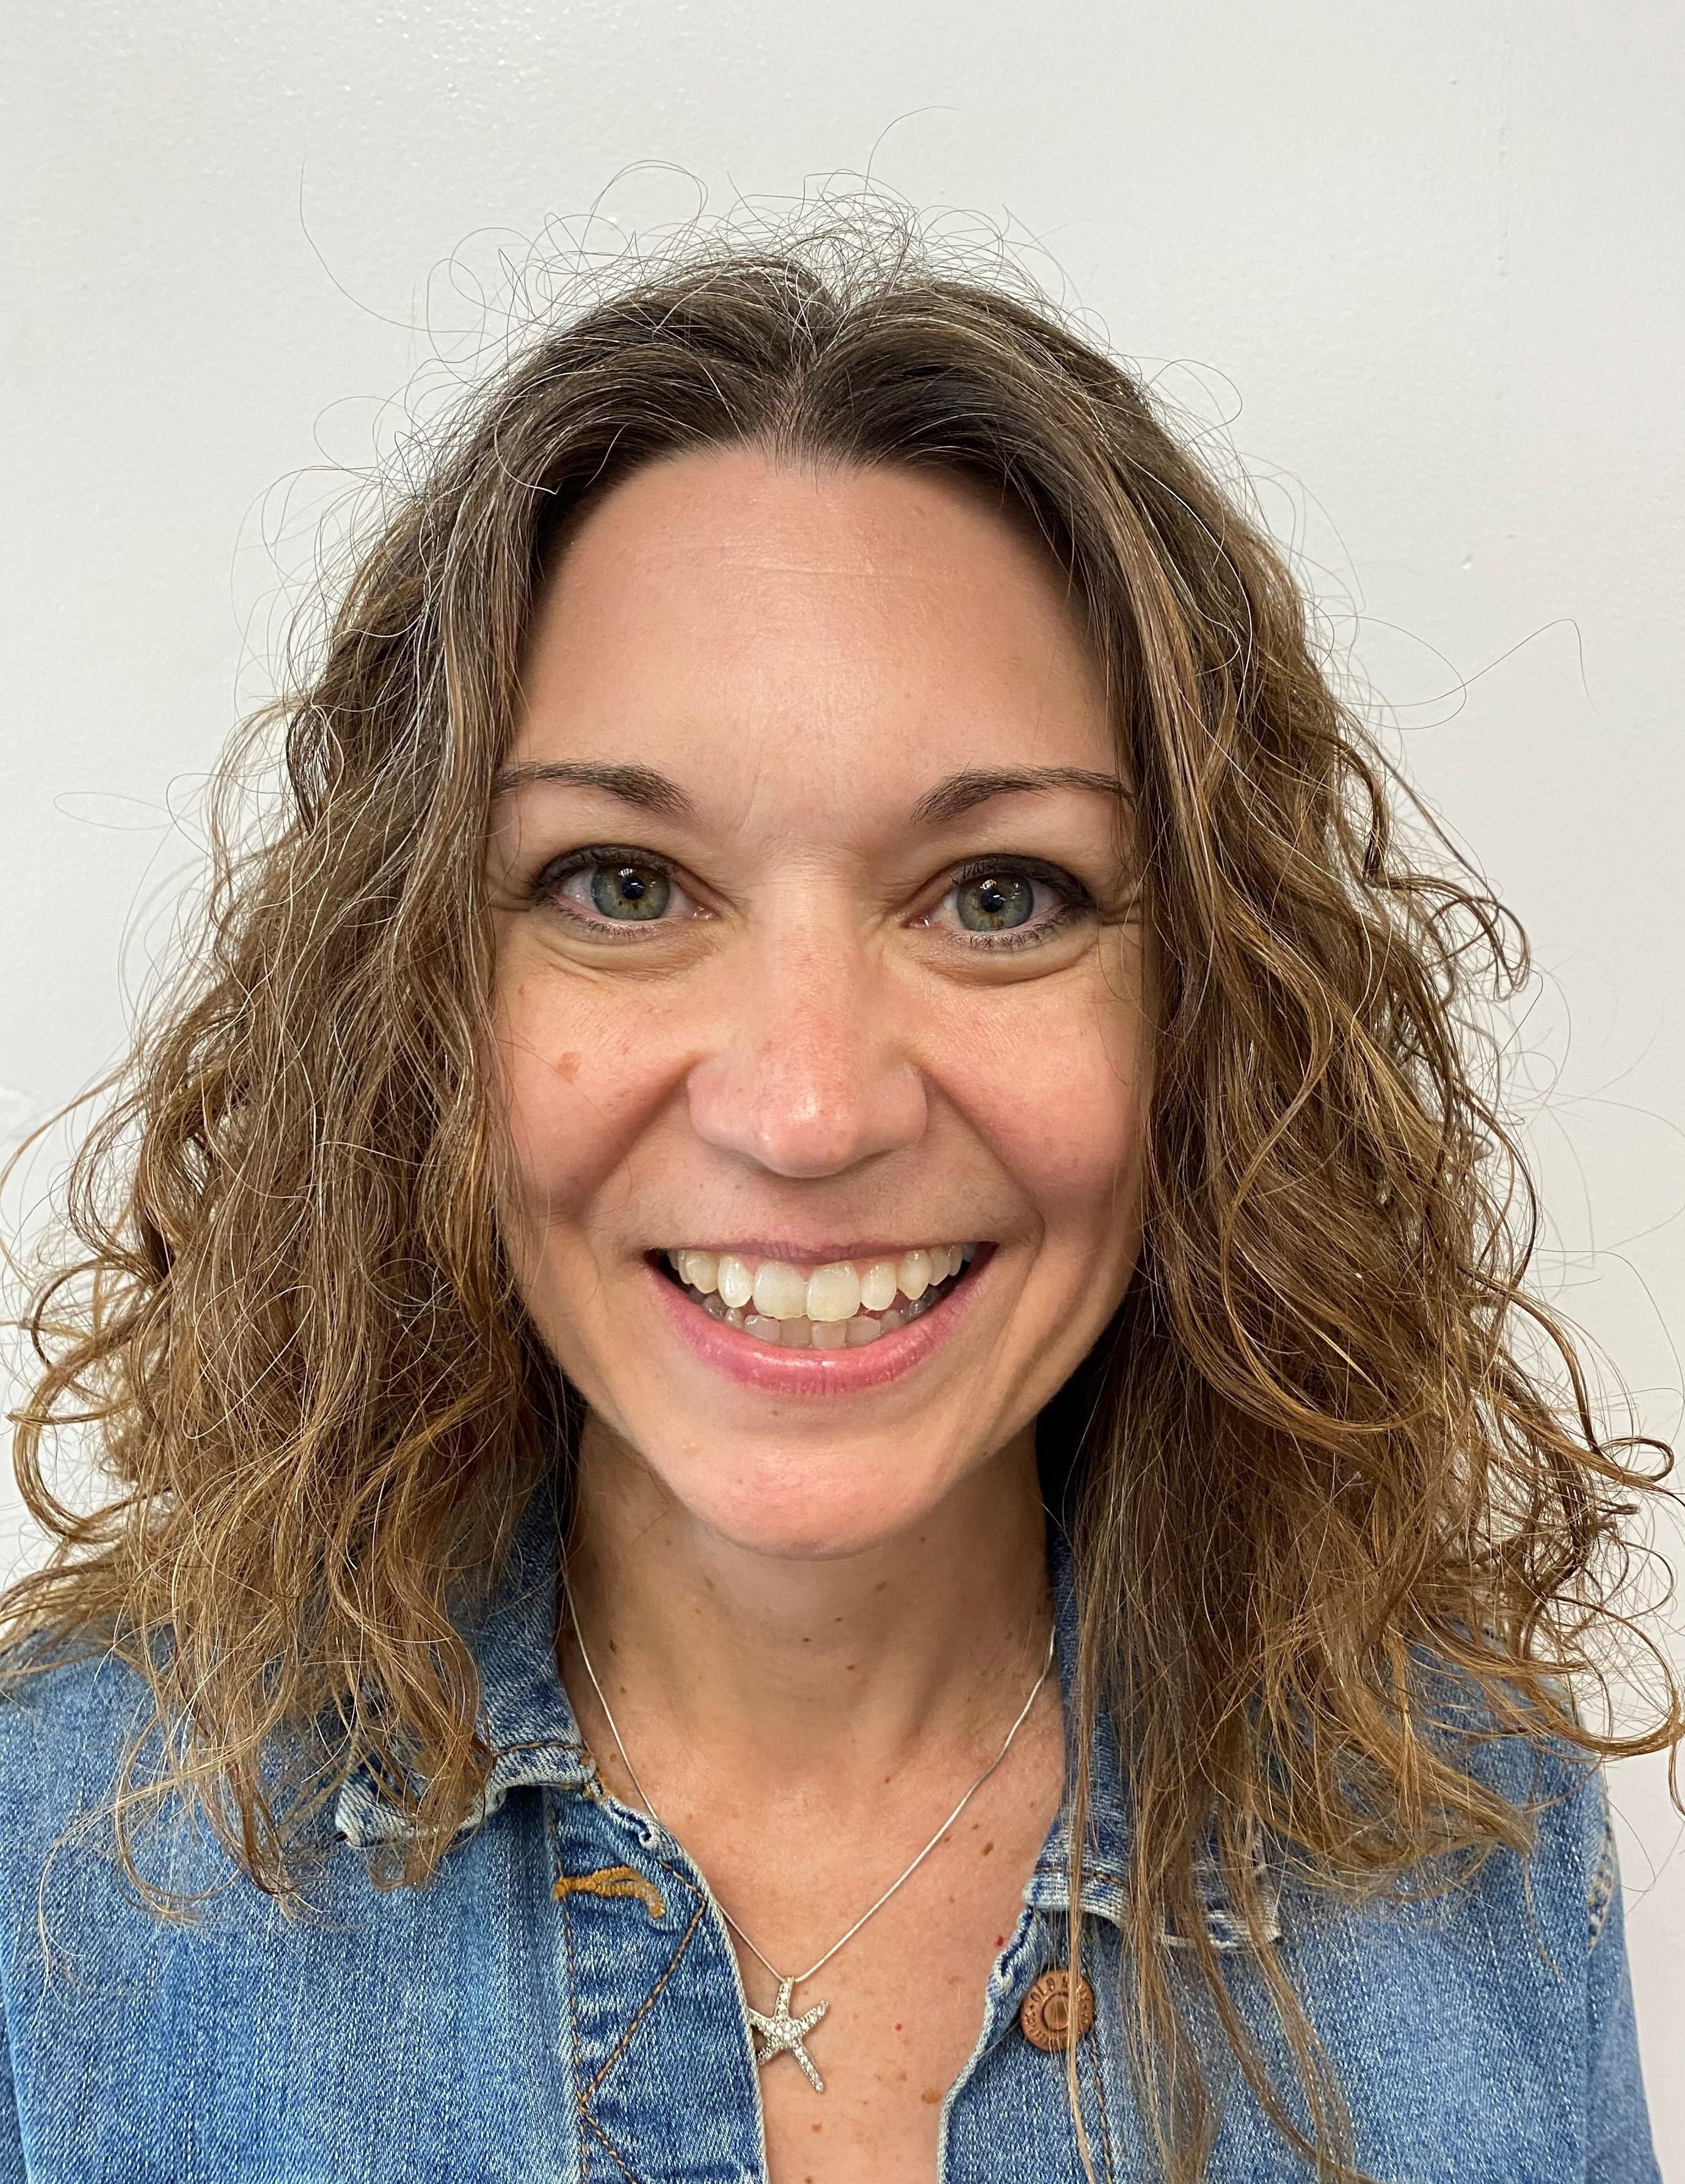 Elaina van der Sommen, School Counselor